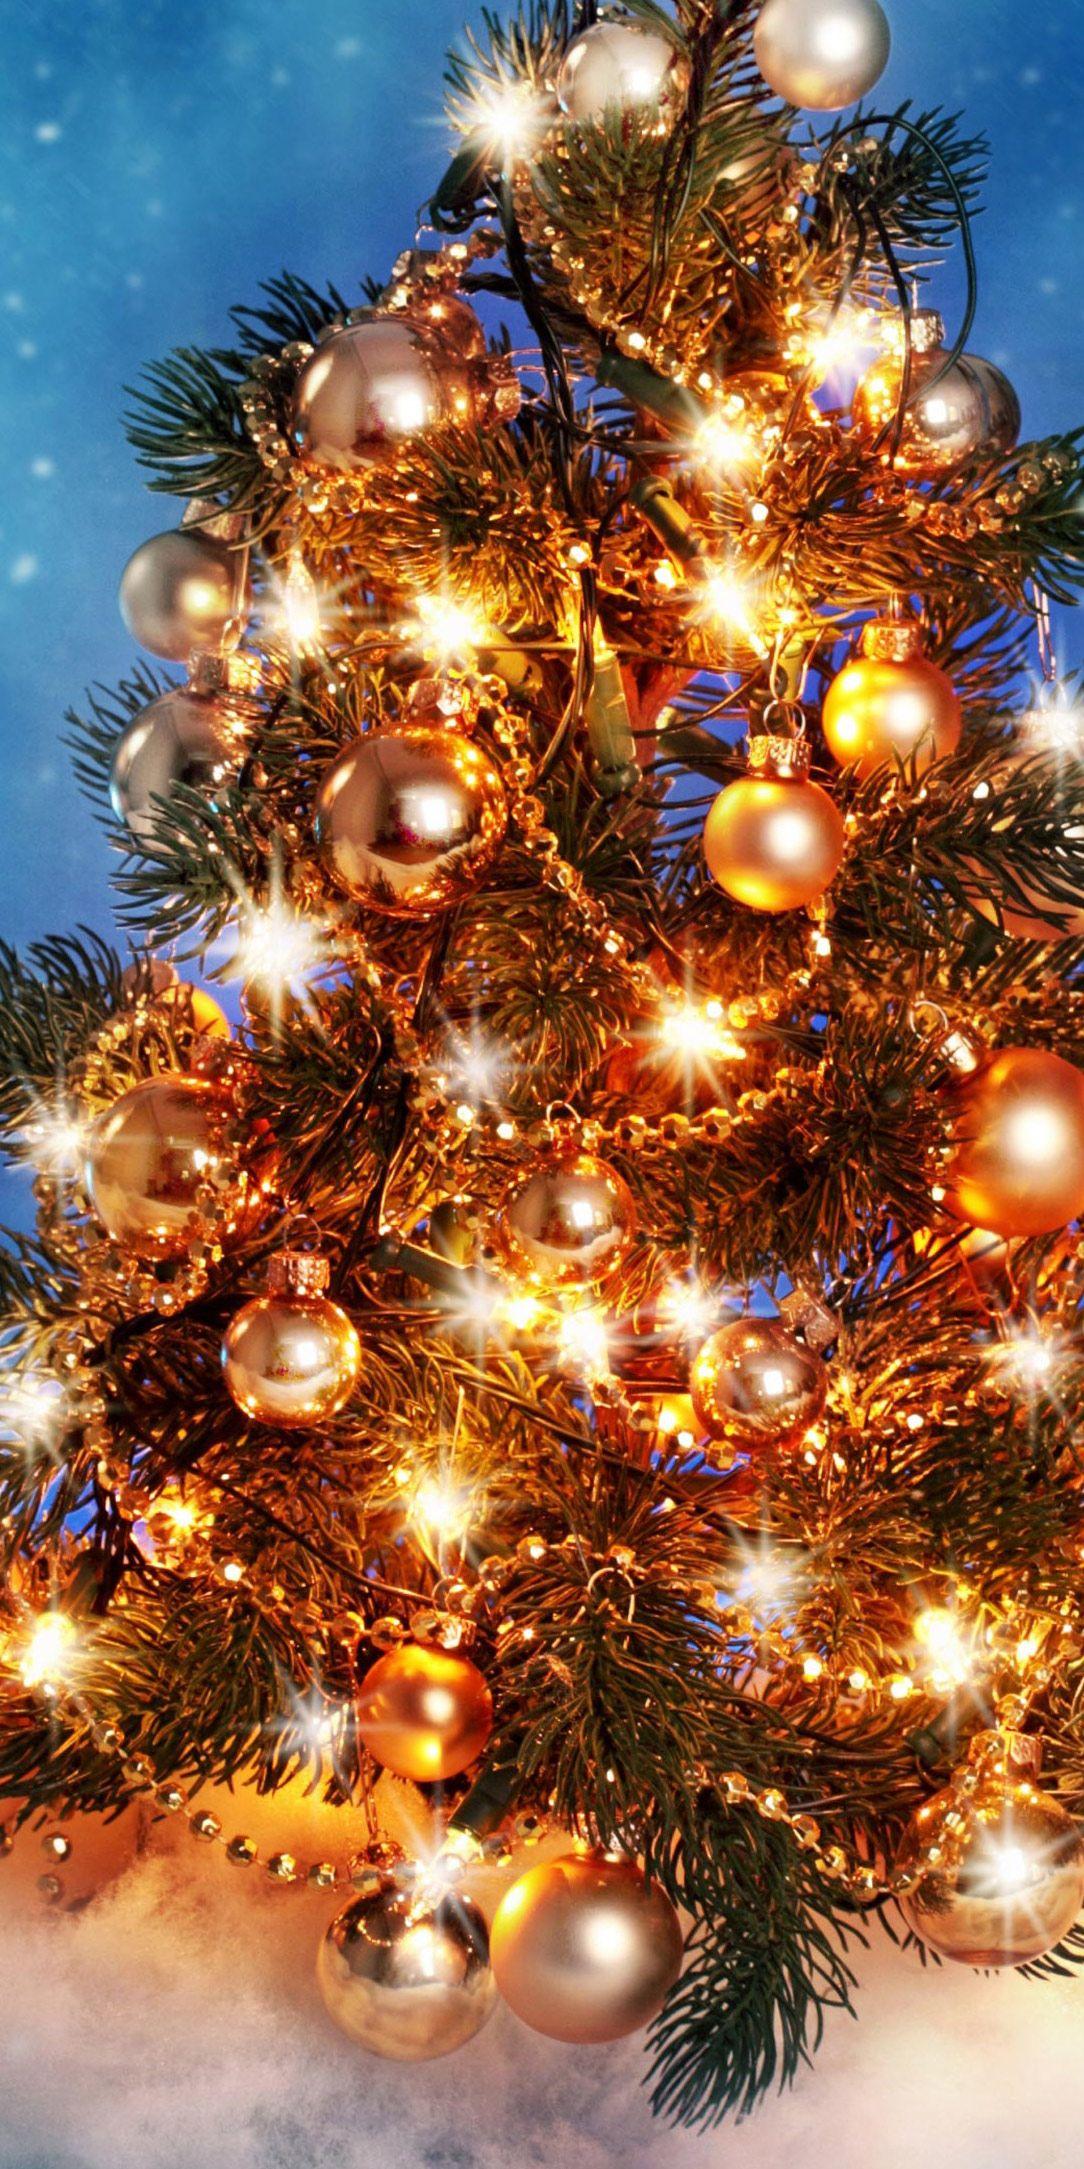 Christmas HD and Widescreen Wallpapers Christmas Tree